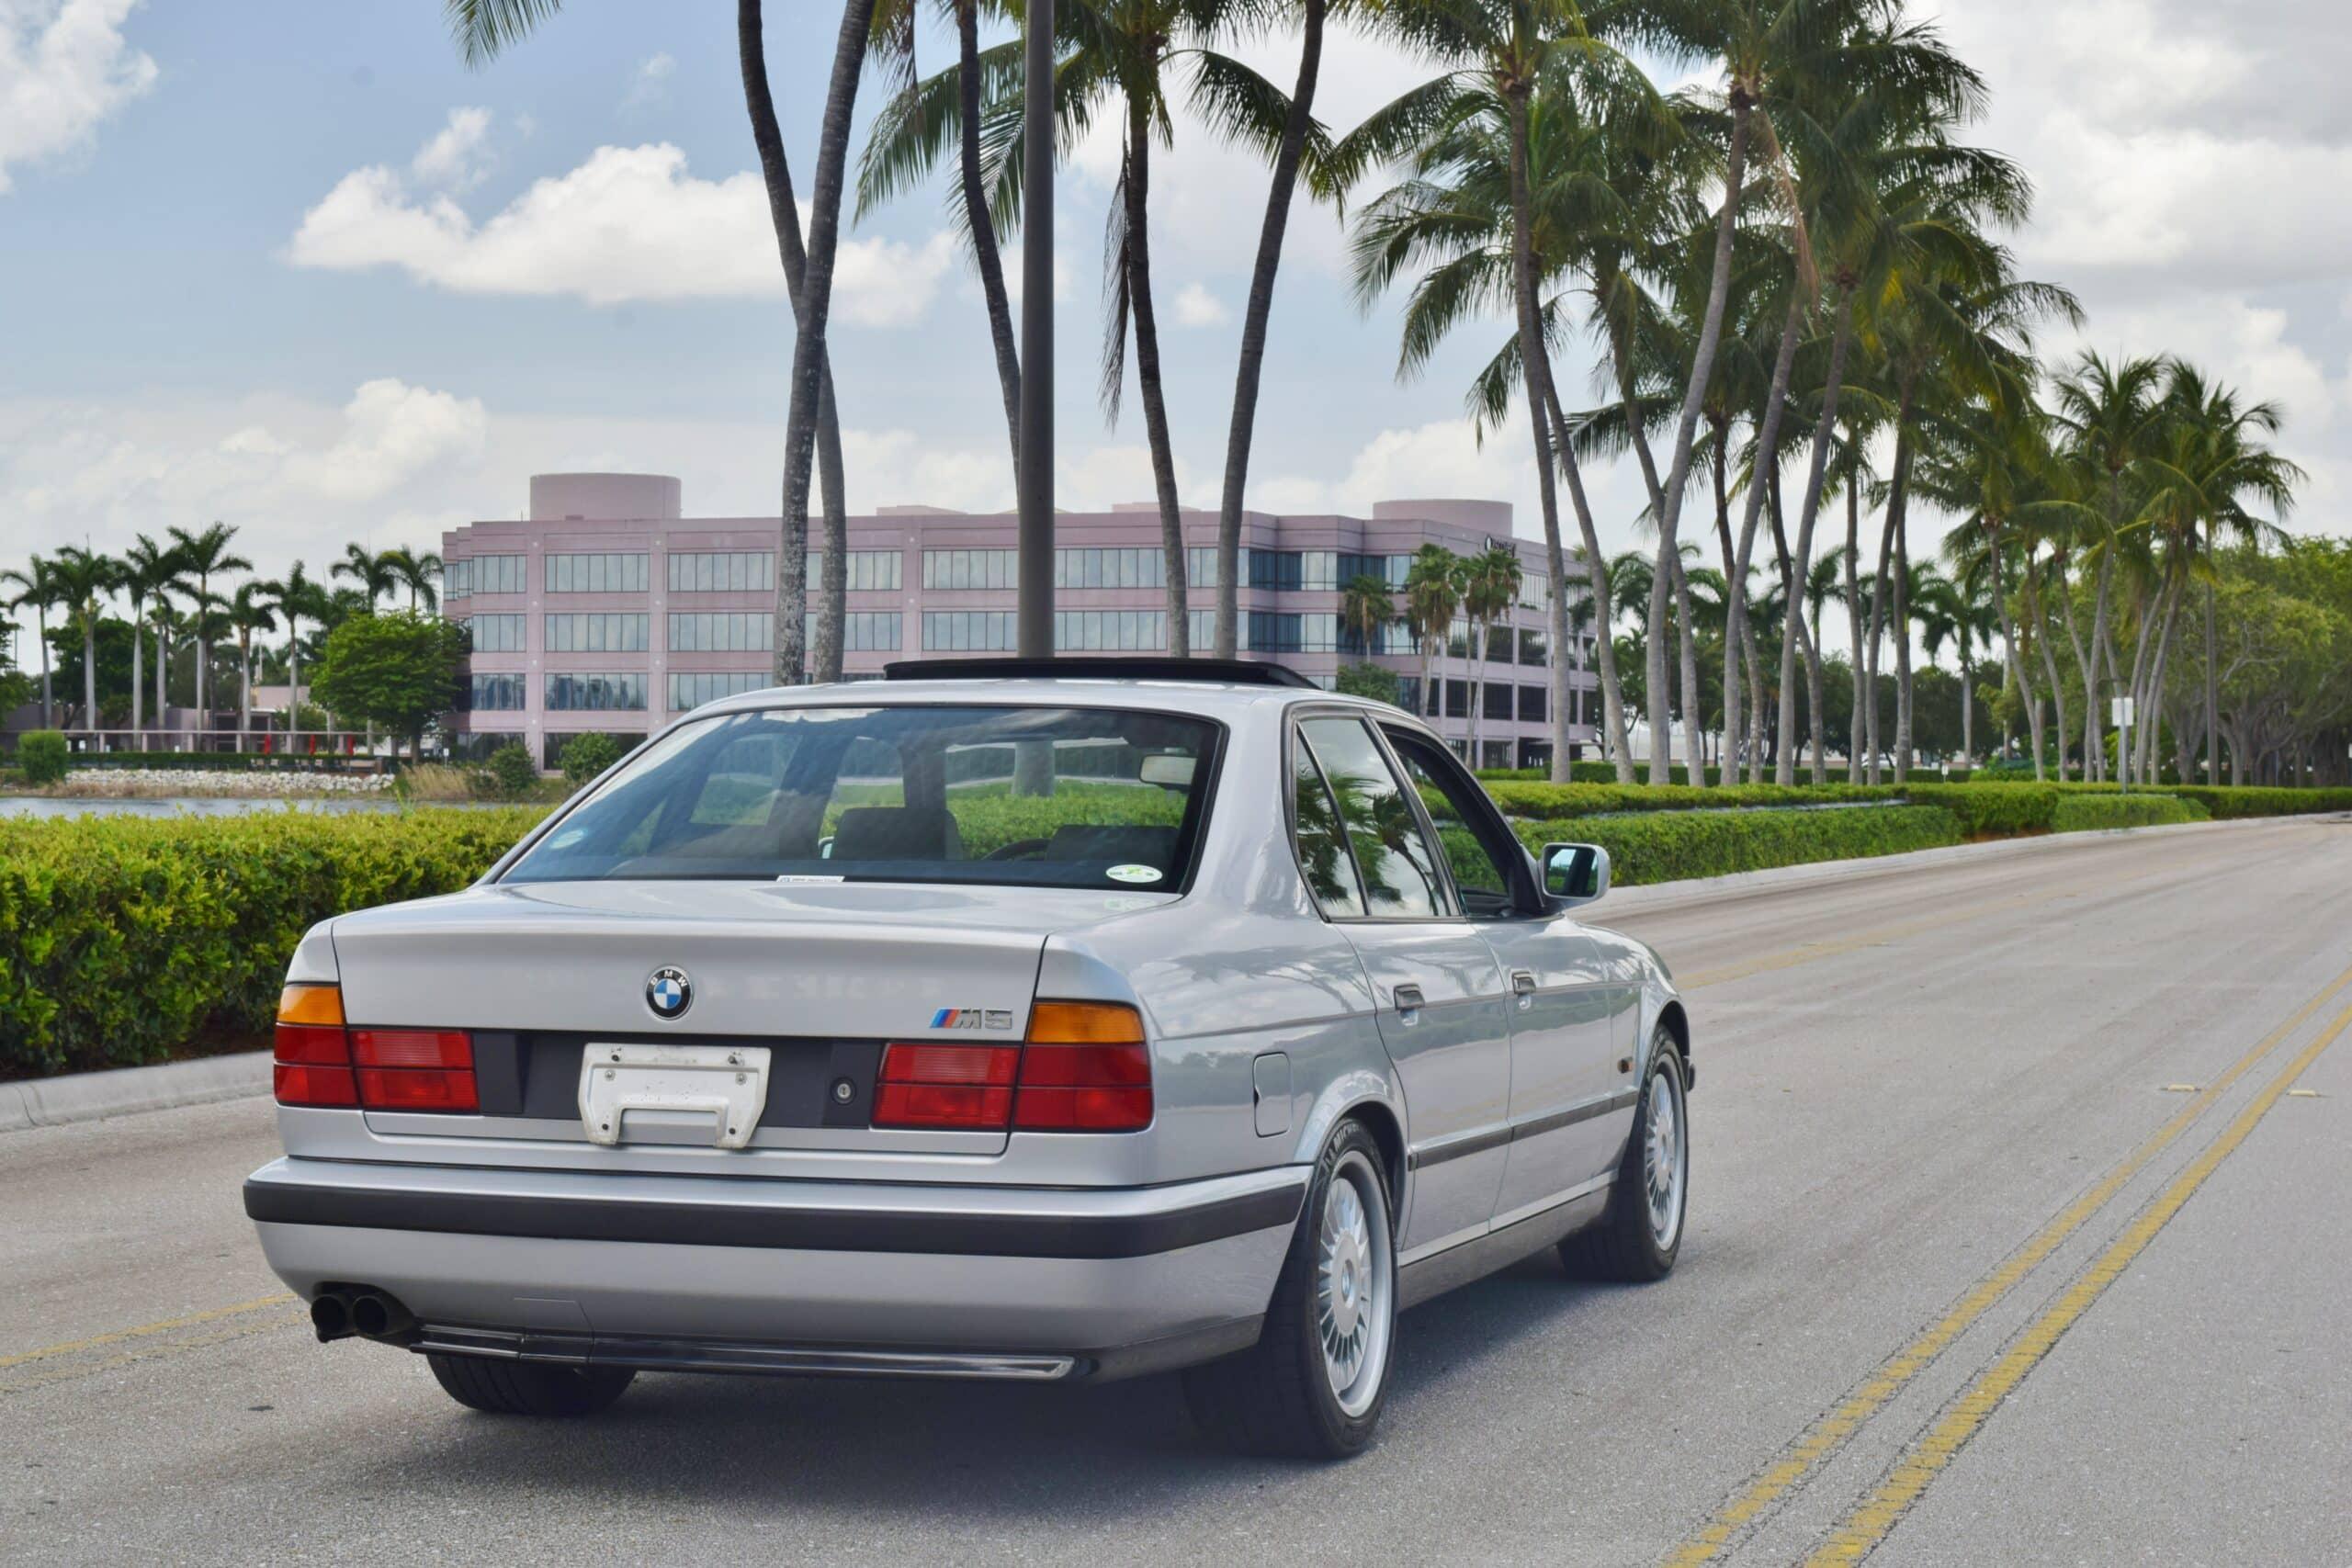 1991 BMW M5 Euro E34 Hand Built S38-Turbine M Technic Wheels-Euro Motorsport Cloth Interior-LOW MILES